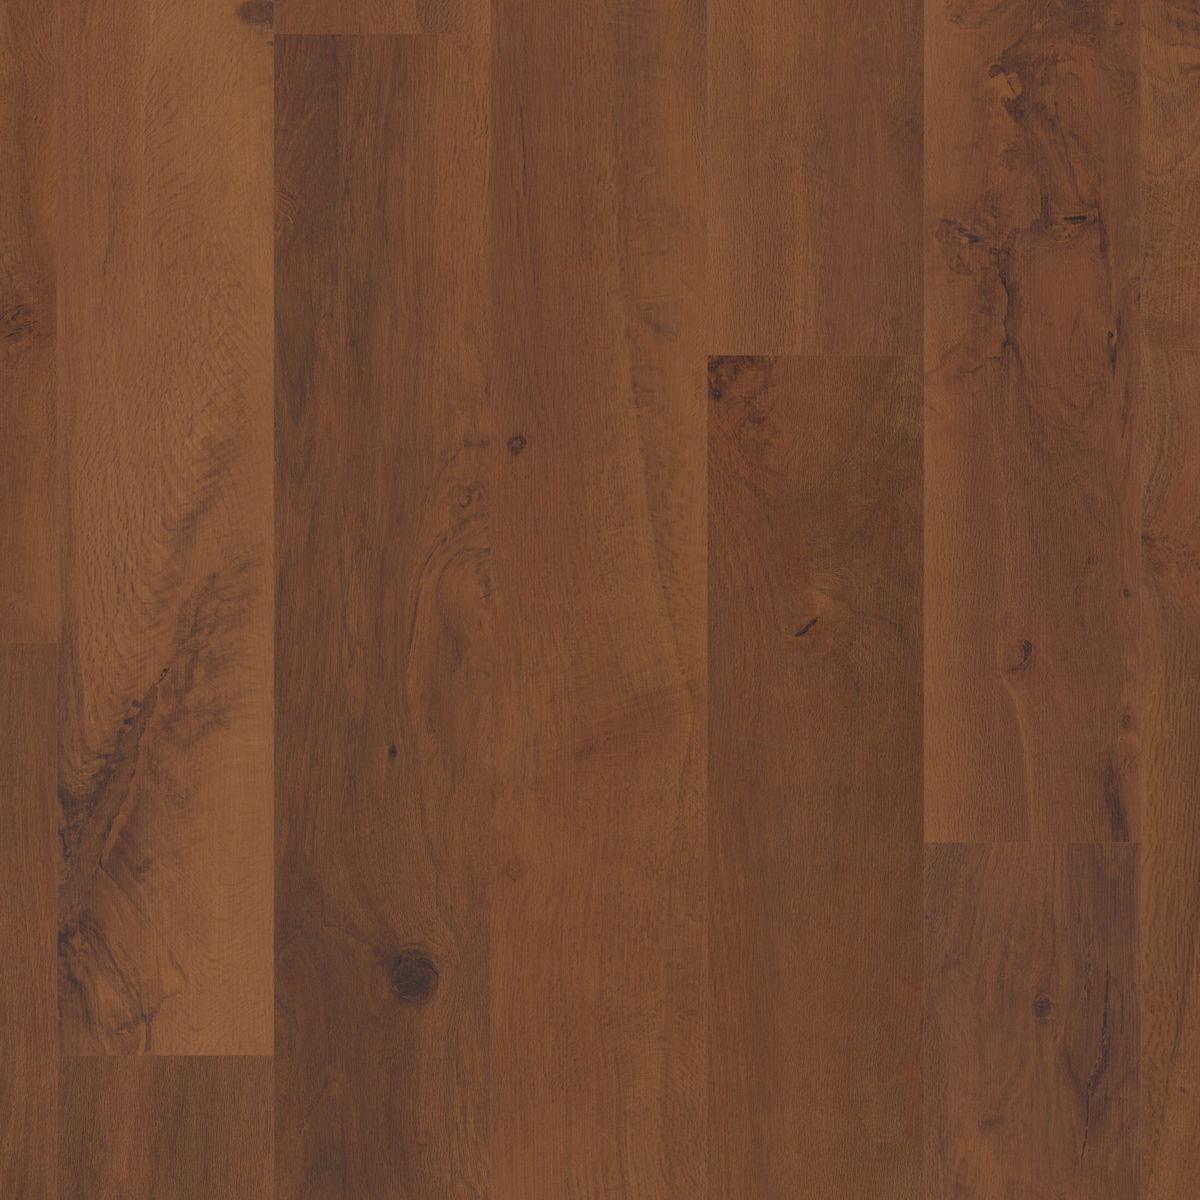 Karndean Van Gogh Christchurch Oak Vgw54t Vinyl Flooring